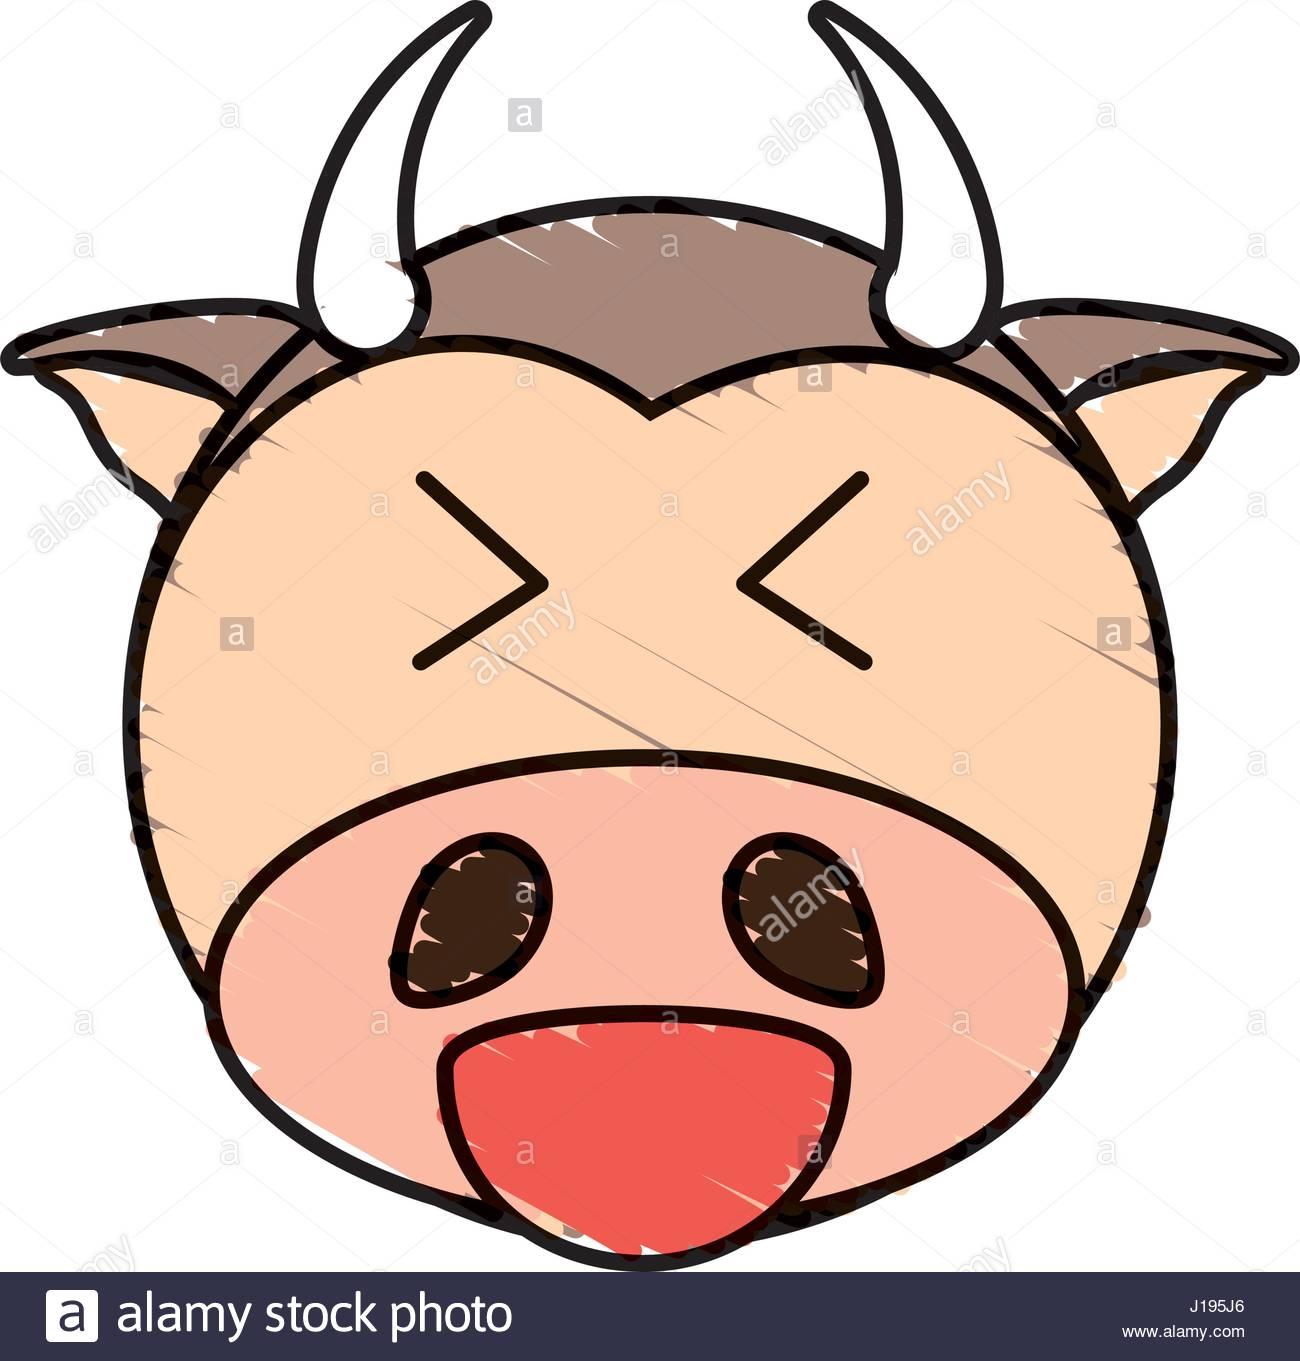 1300x1361 Cute Cow Drawing Animal Stock Vector Art Amp Illustration, Vector